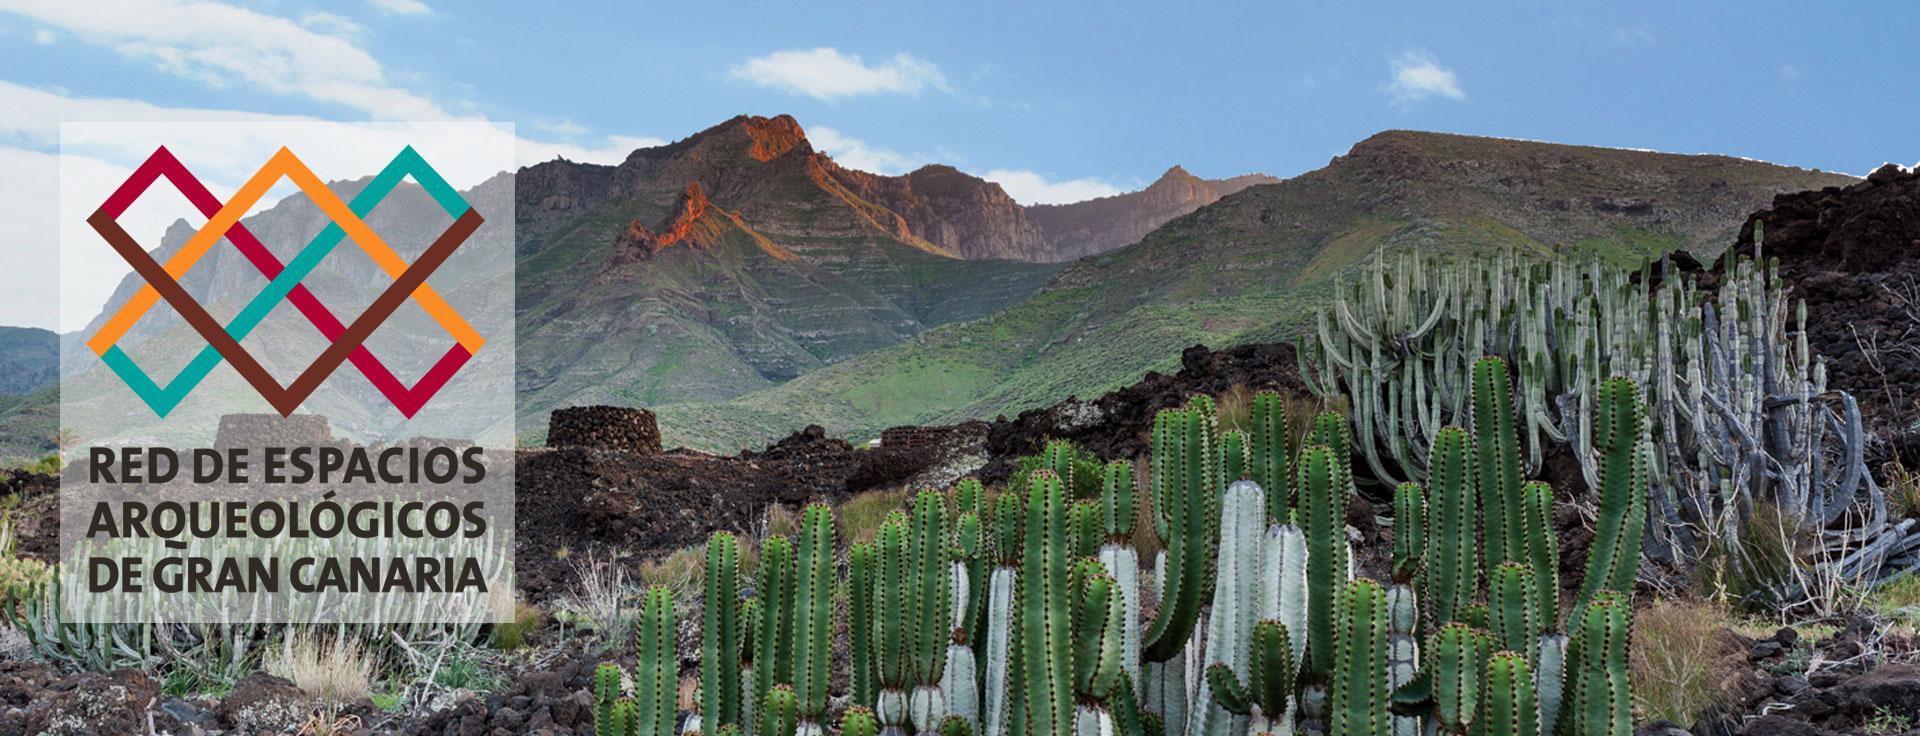 Red de Espacios Arqueológicos de Gran Canaria